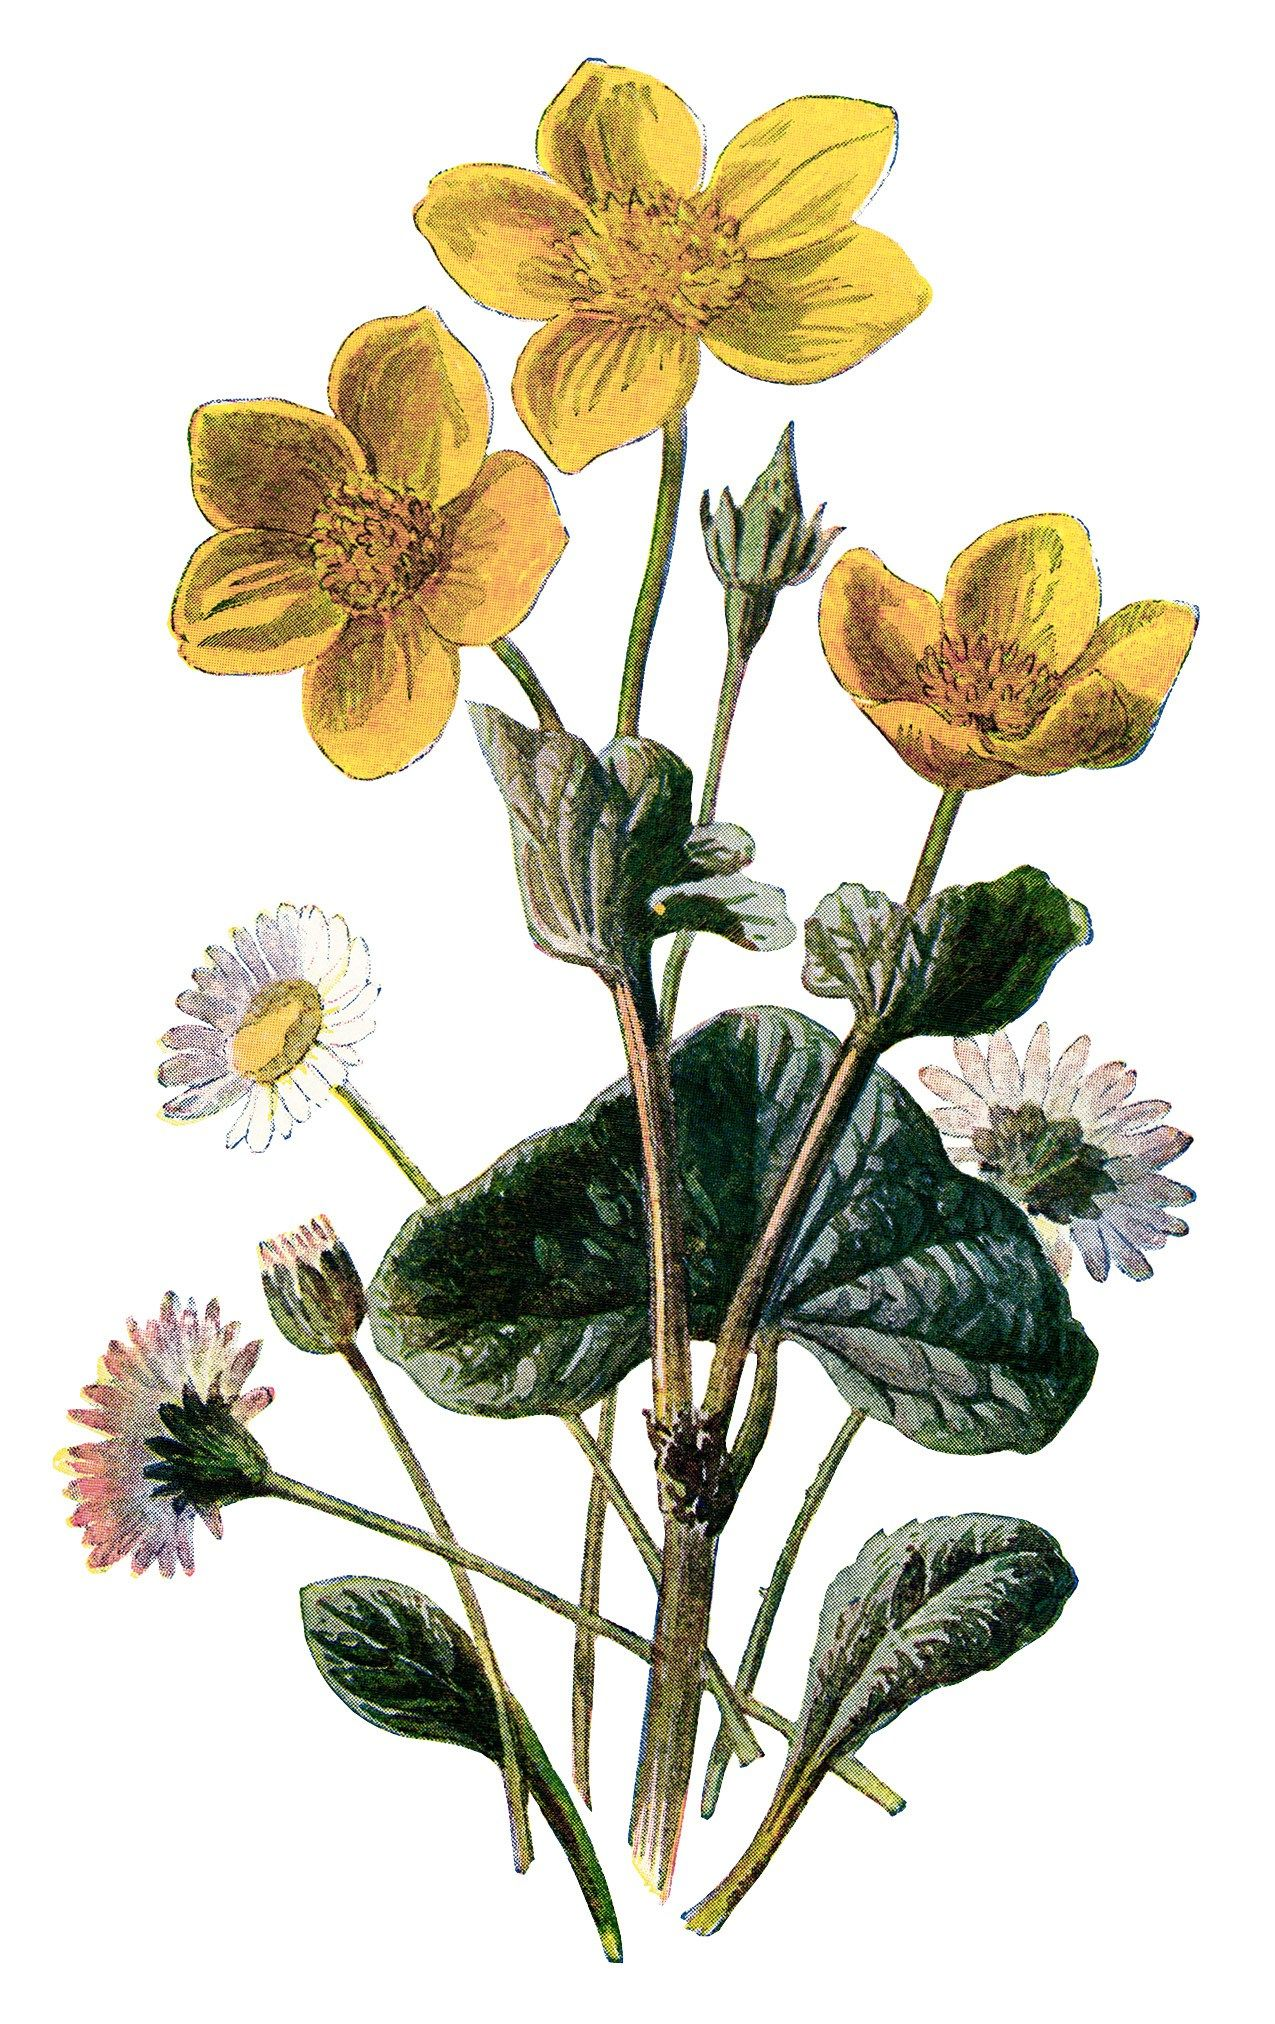 marigold clip art, vintage flower illustration, yellow flower.